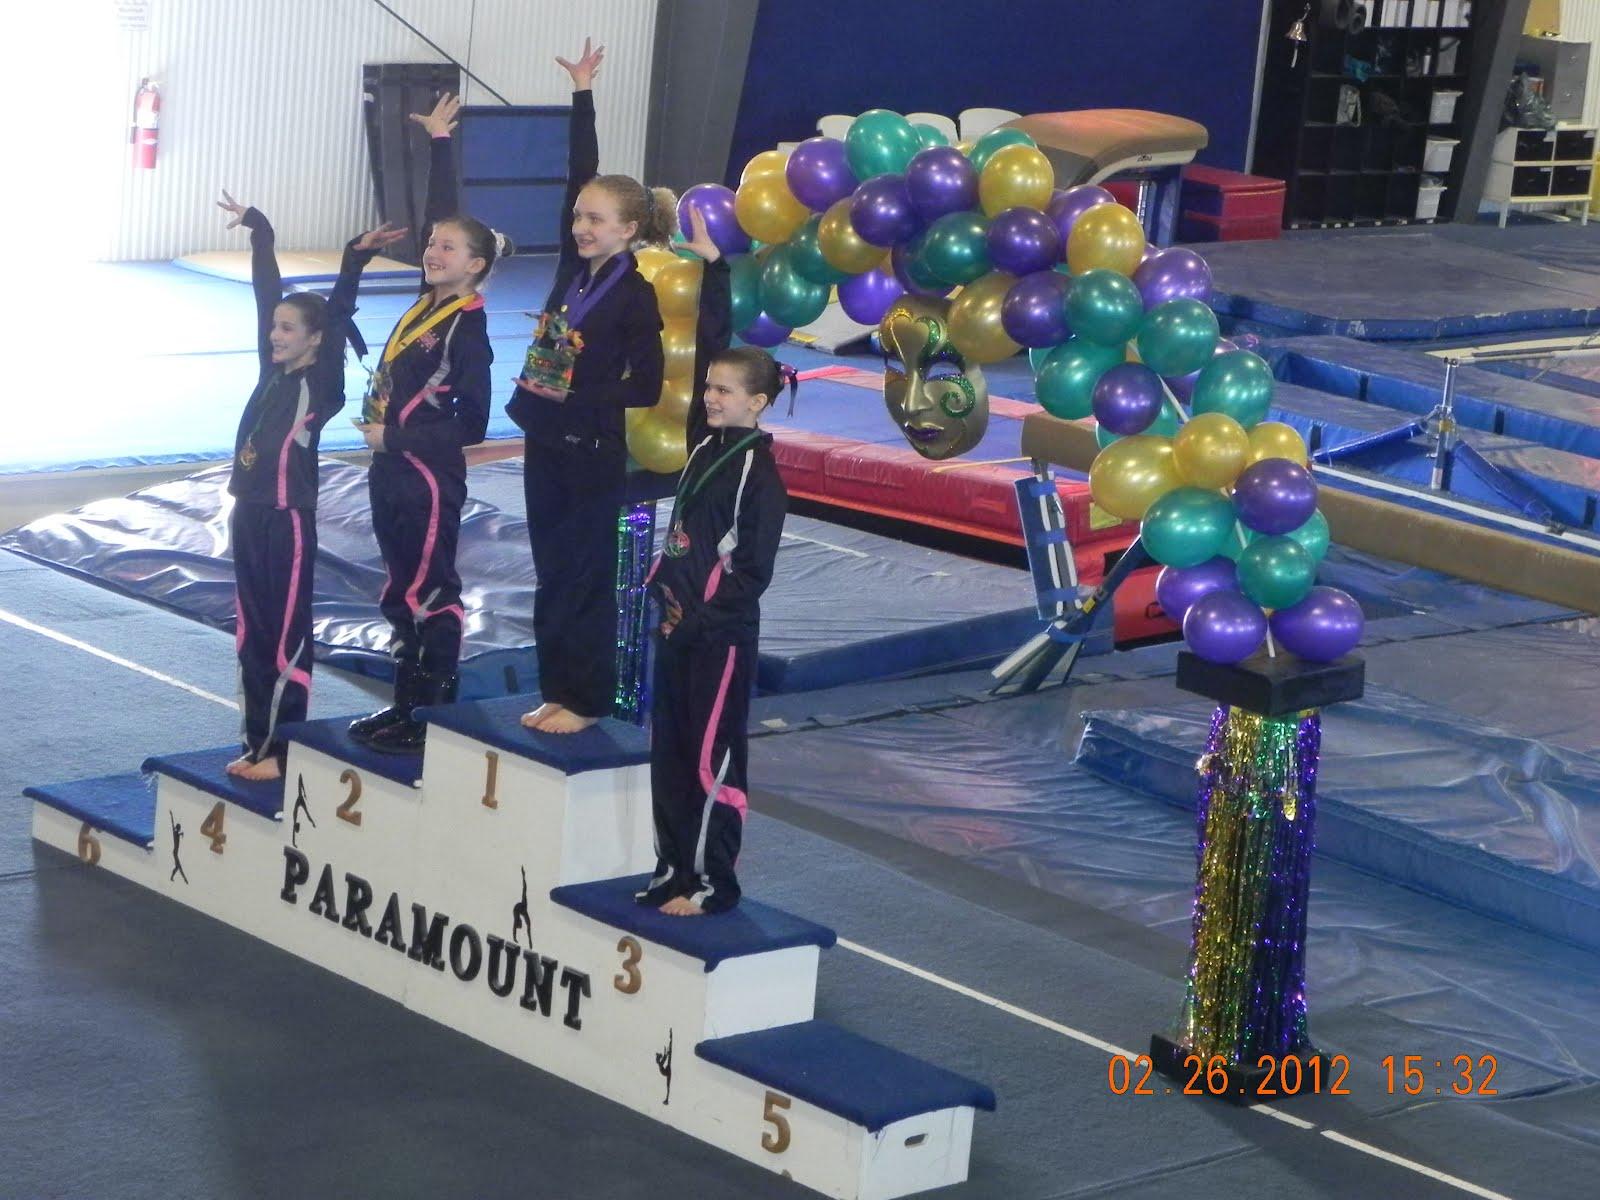 wv state gymnastics meet 2013 results